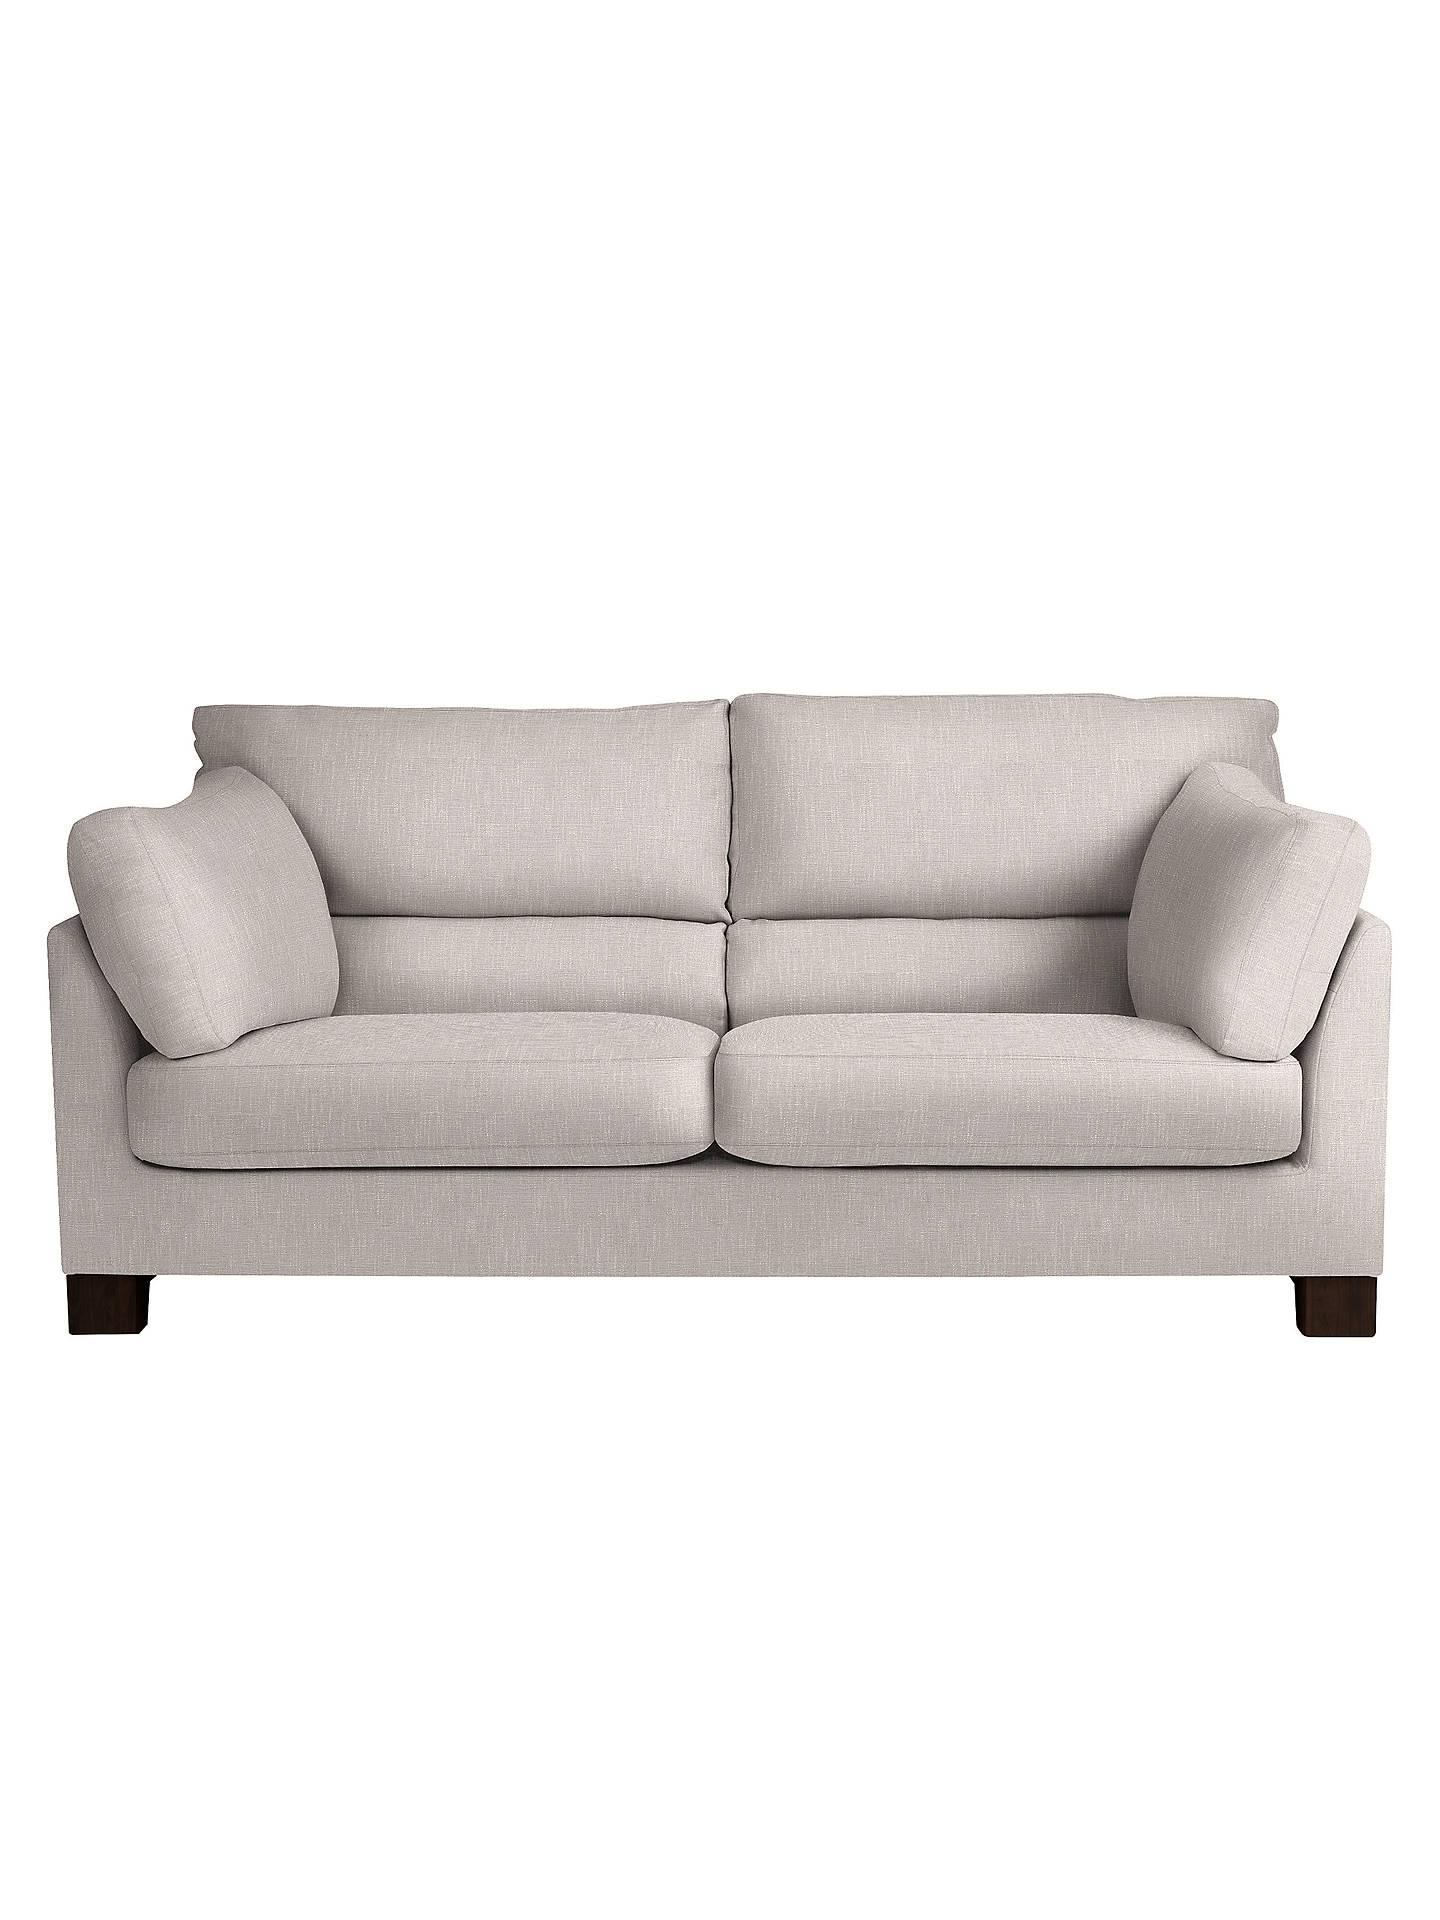 John Lewis Ikon High Back Large 3 Seater Sofa, Henley French ...